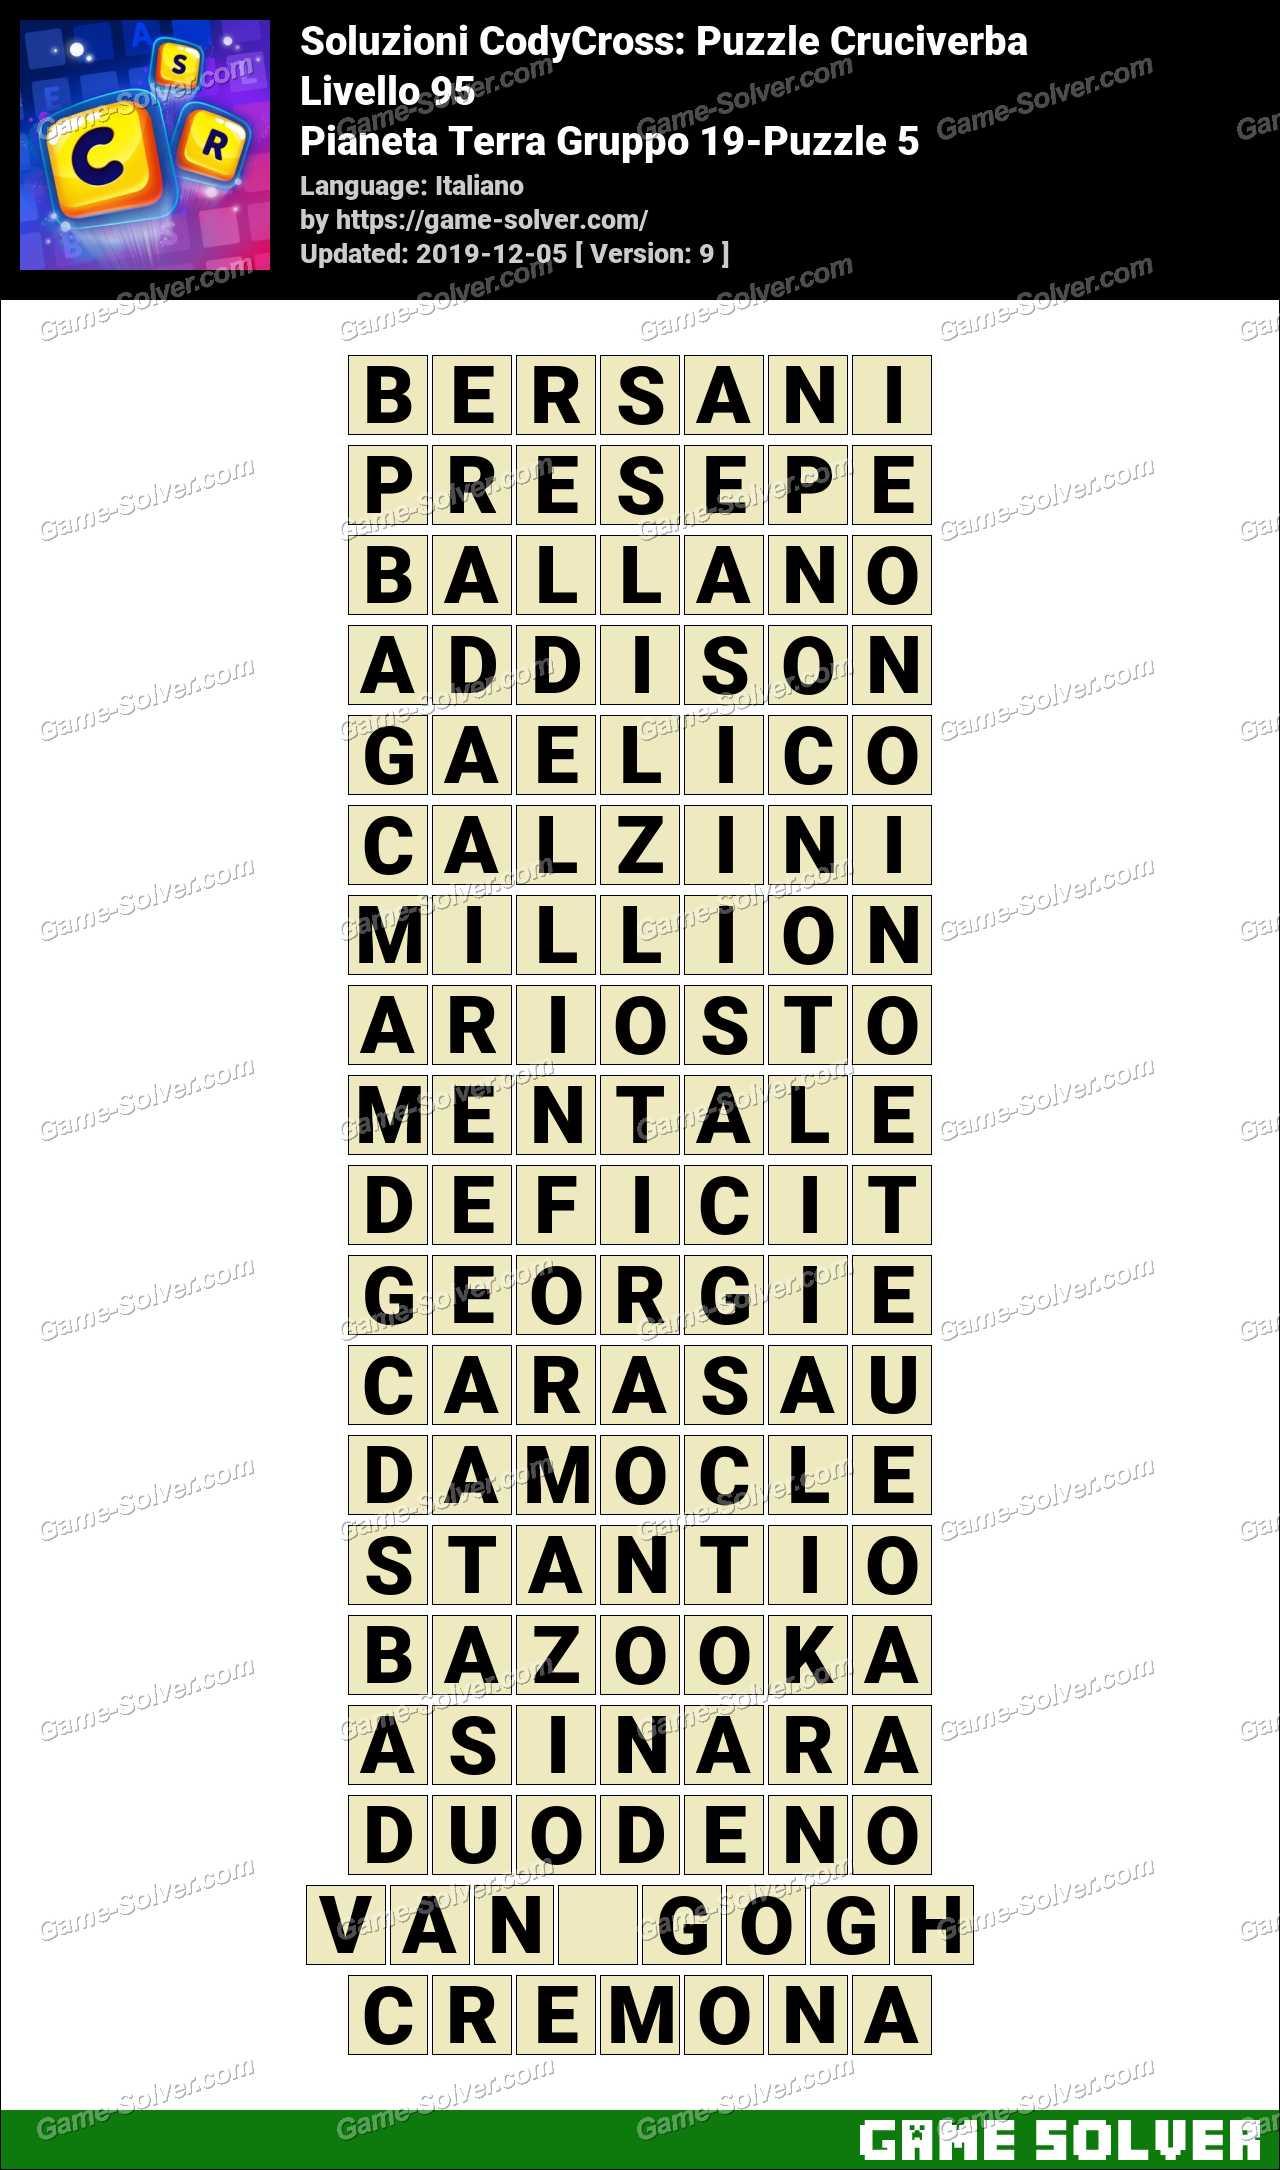 Soluzioni CodyCross Pianeta Terra Gruppo 19-Puzzle 5